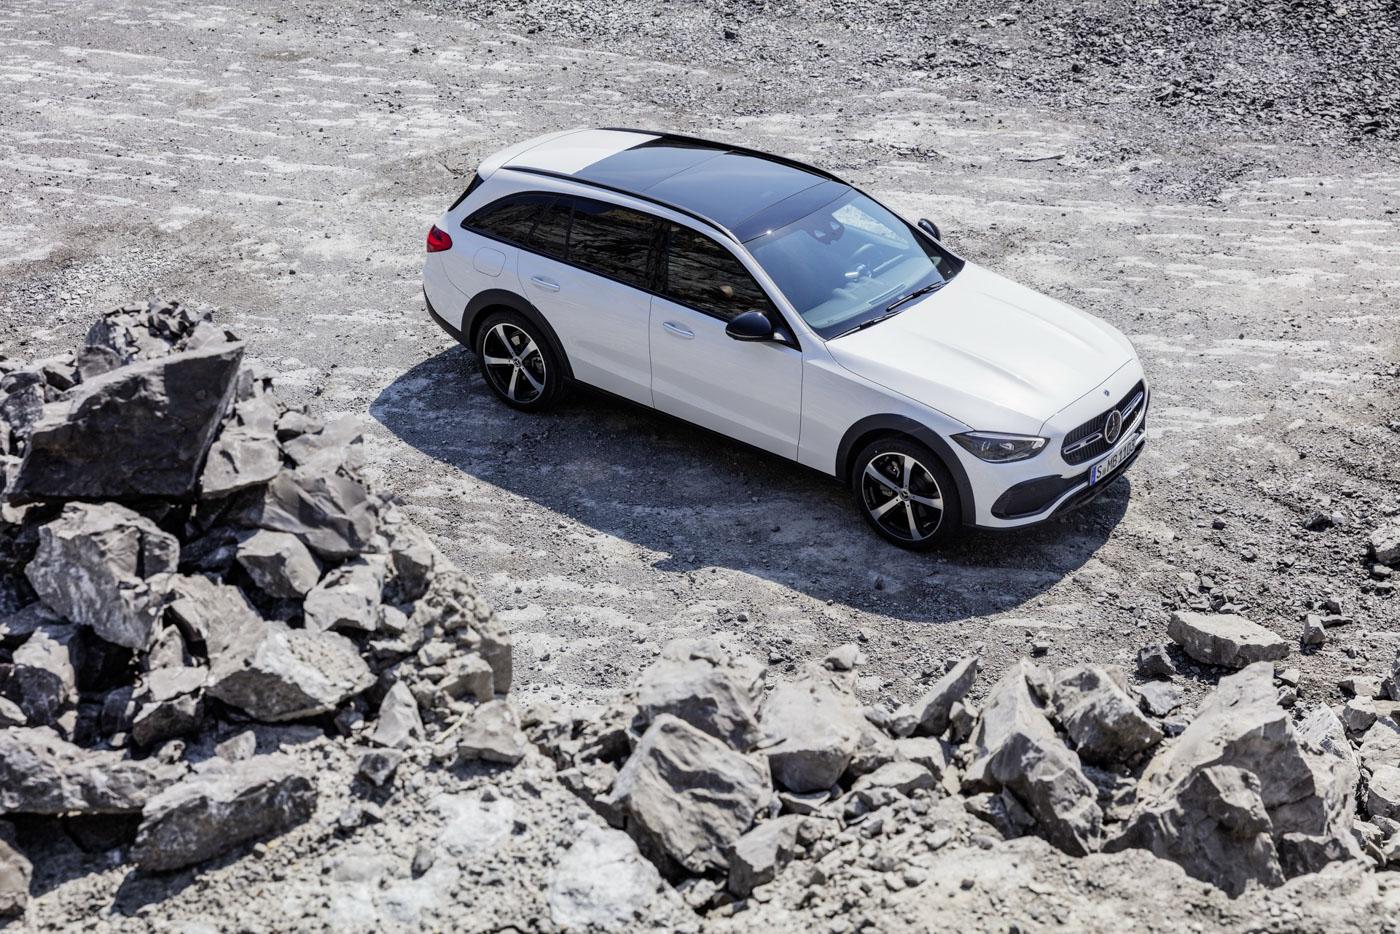 Mercedes-benz-c-class-all-terrain-di-den-moi-noi-cung-mau-xe-gia-dinh-day-thuc-dung (18).JPG